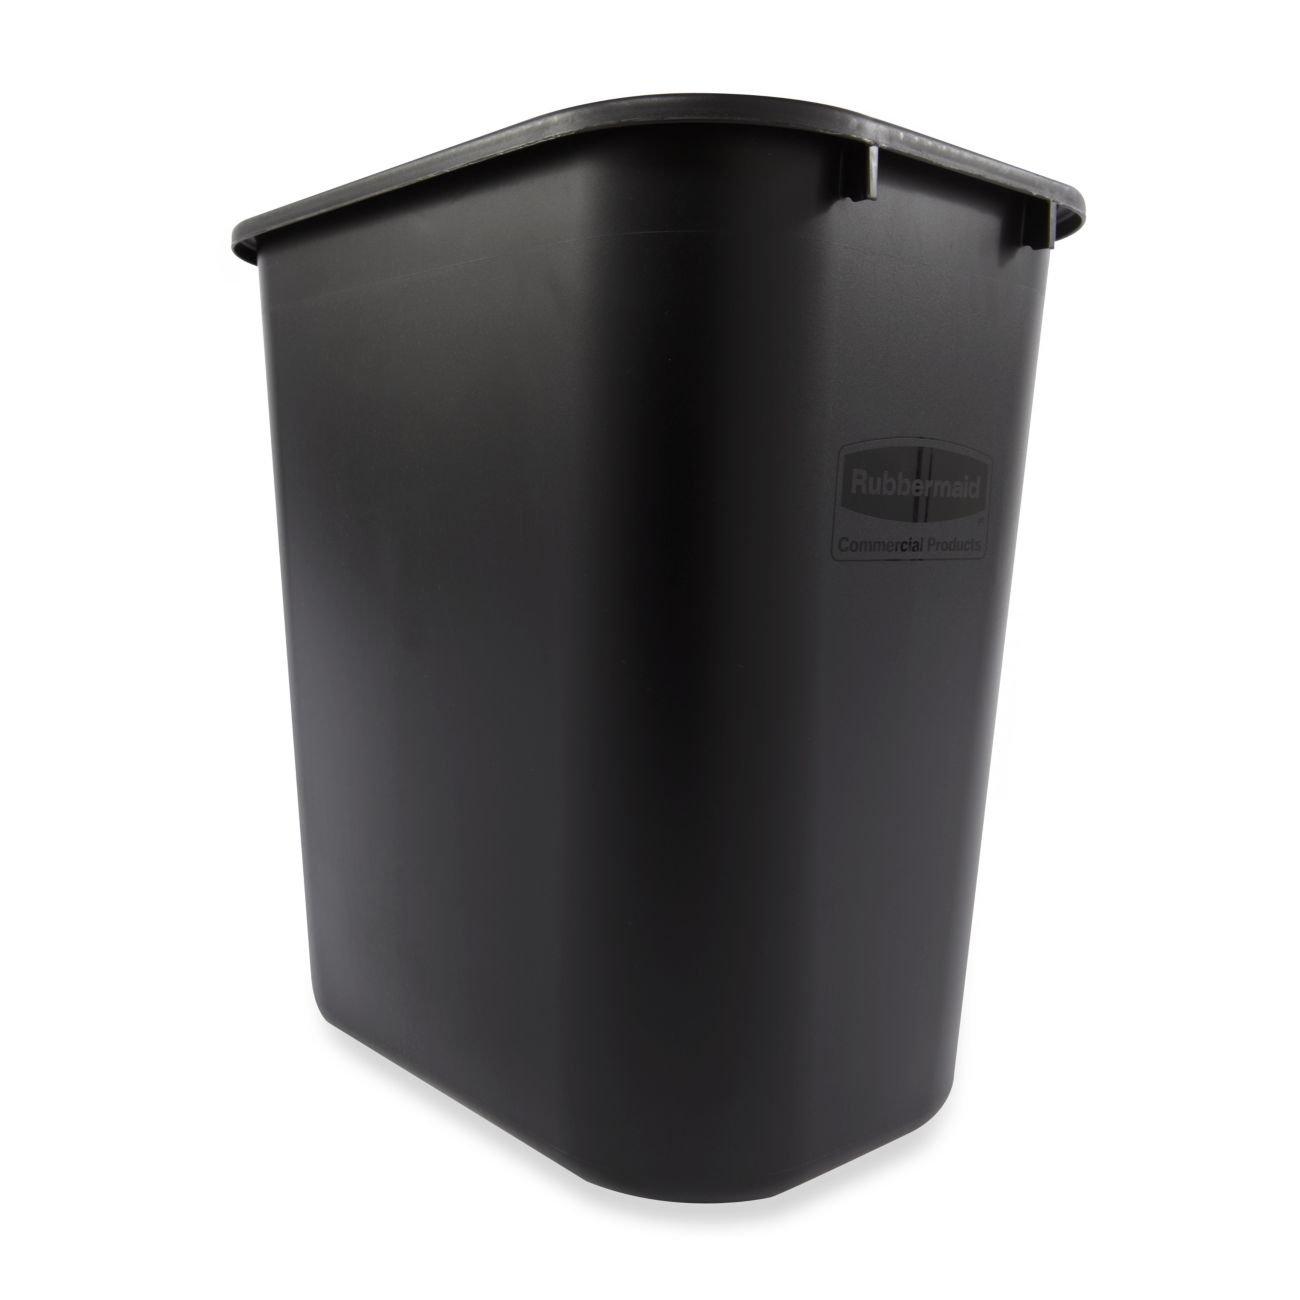 Rubbermaid Commercial 2 gal Rectangular Deskside Plastic Wastebasket FG295200BEIG